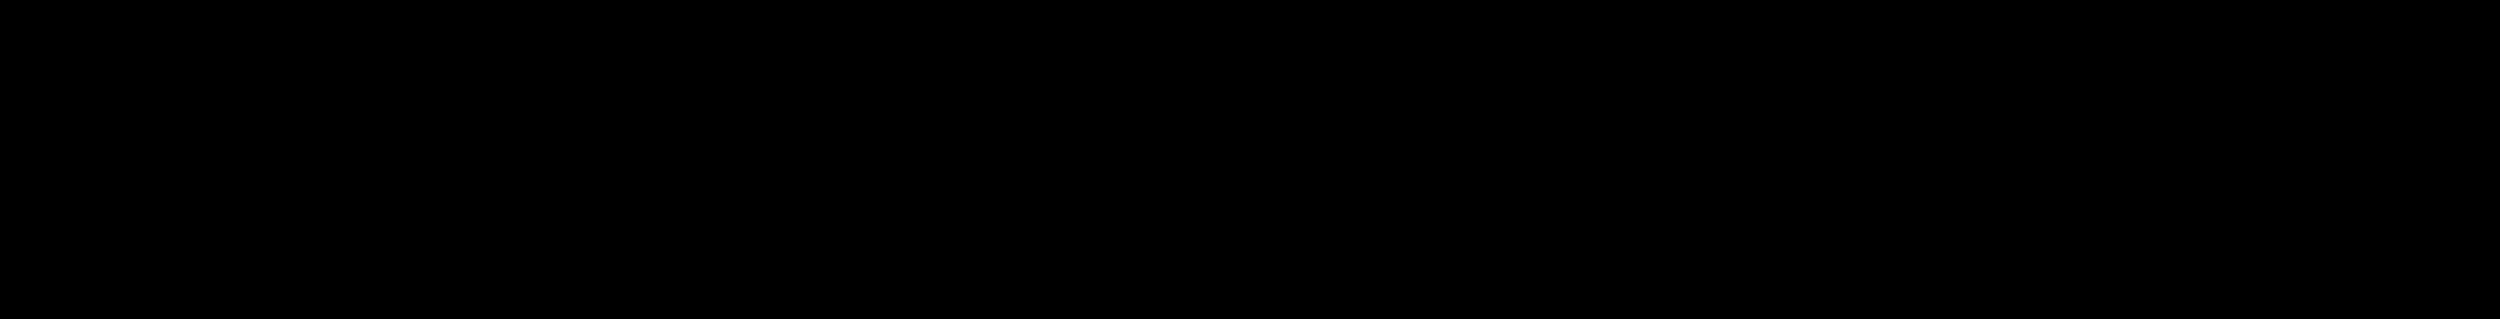 BTheory_Logo_Black.png